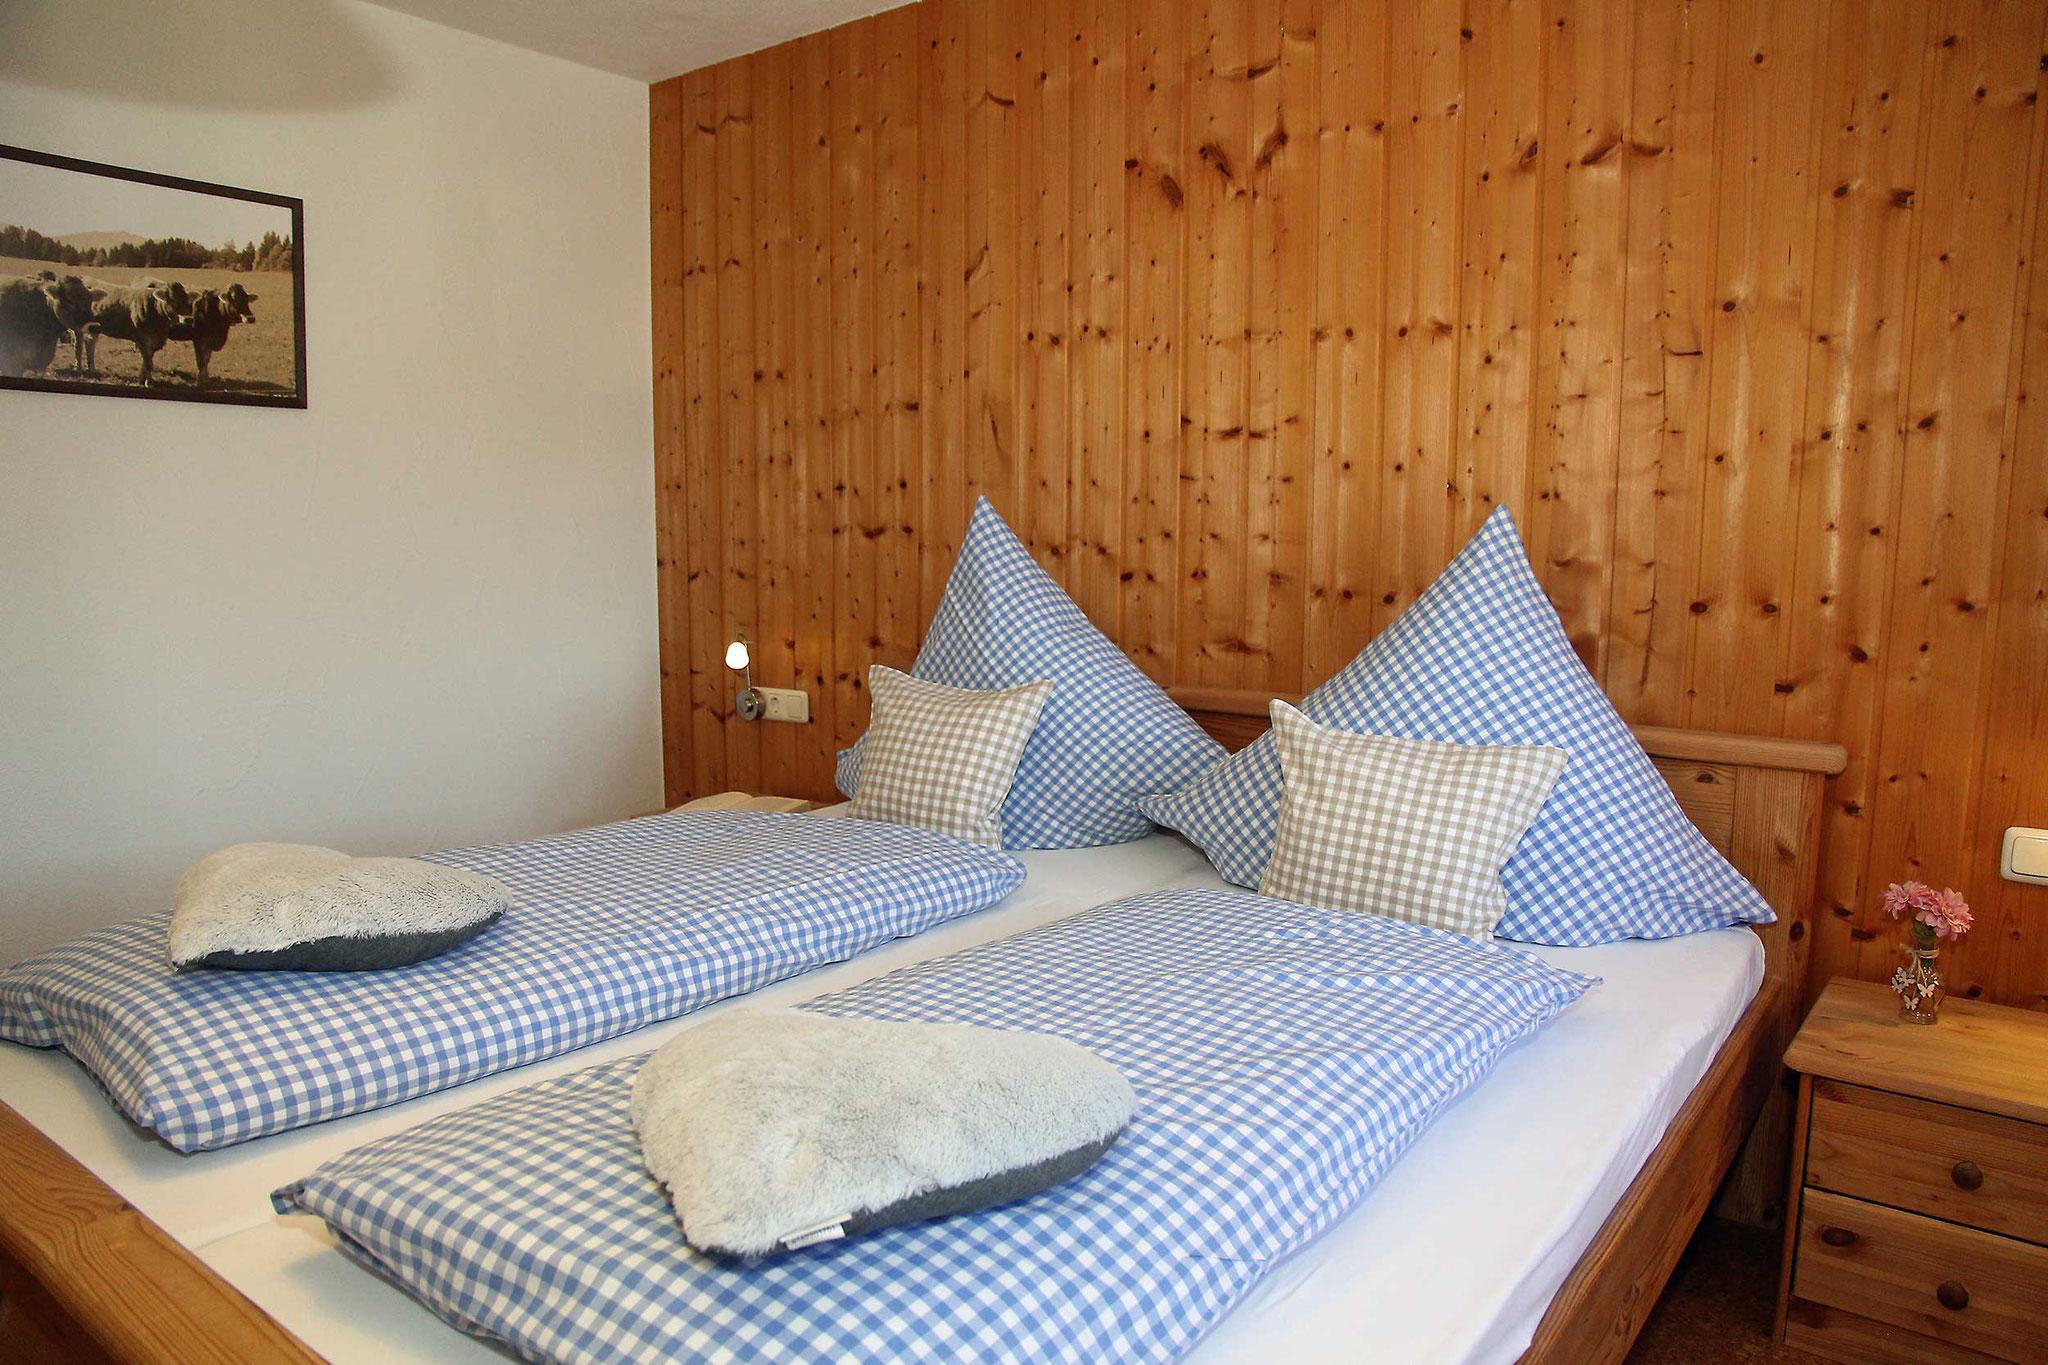 duftig bezogene Betten erwarten Sie